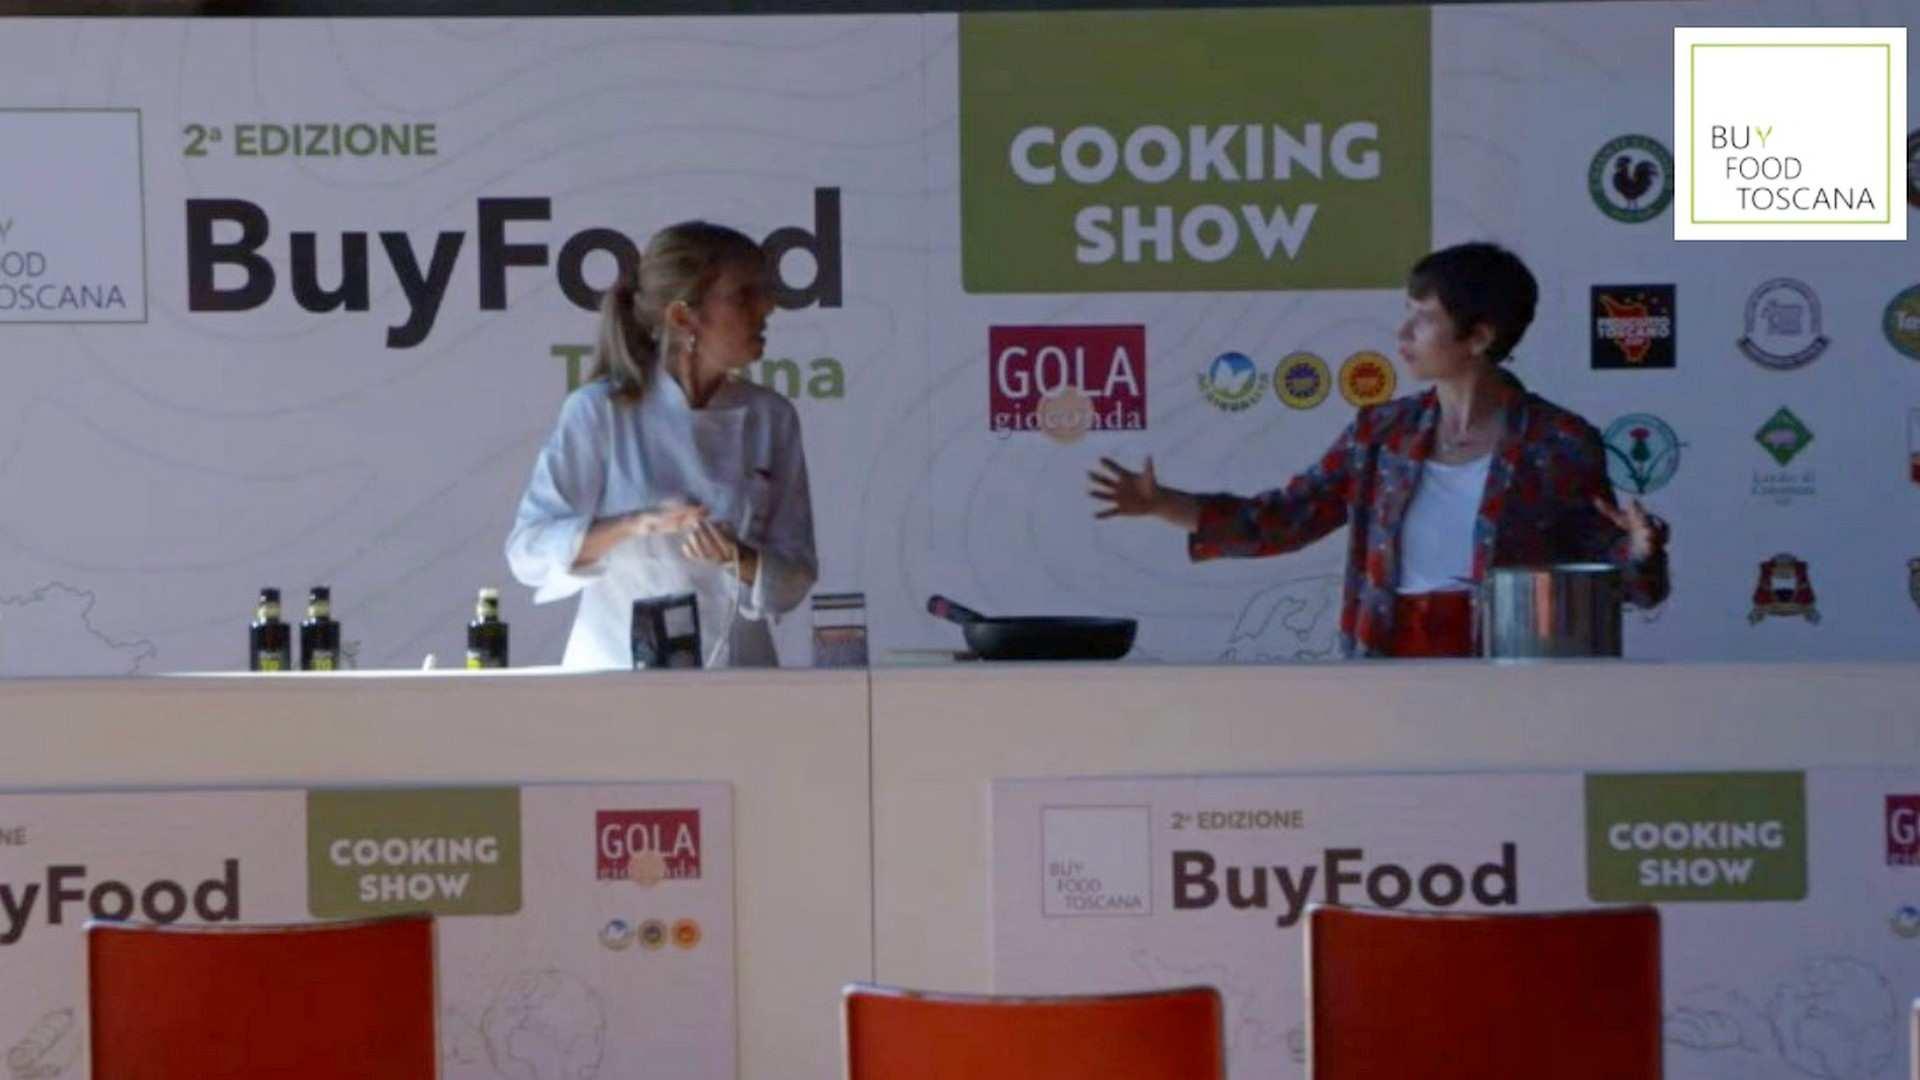 Cooking Show – BuyFood Toscana 2020